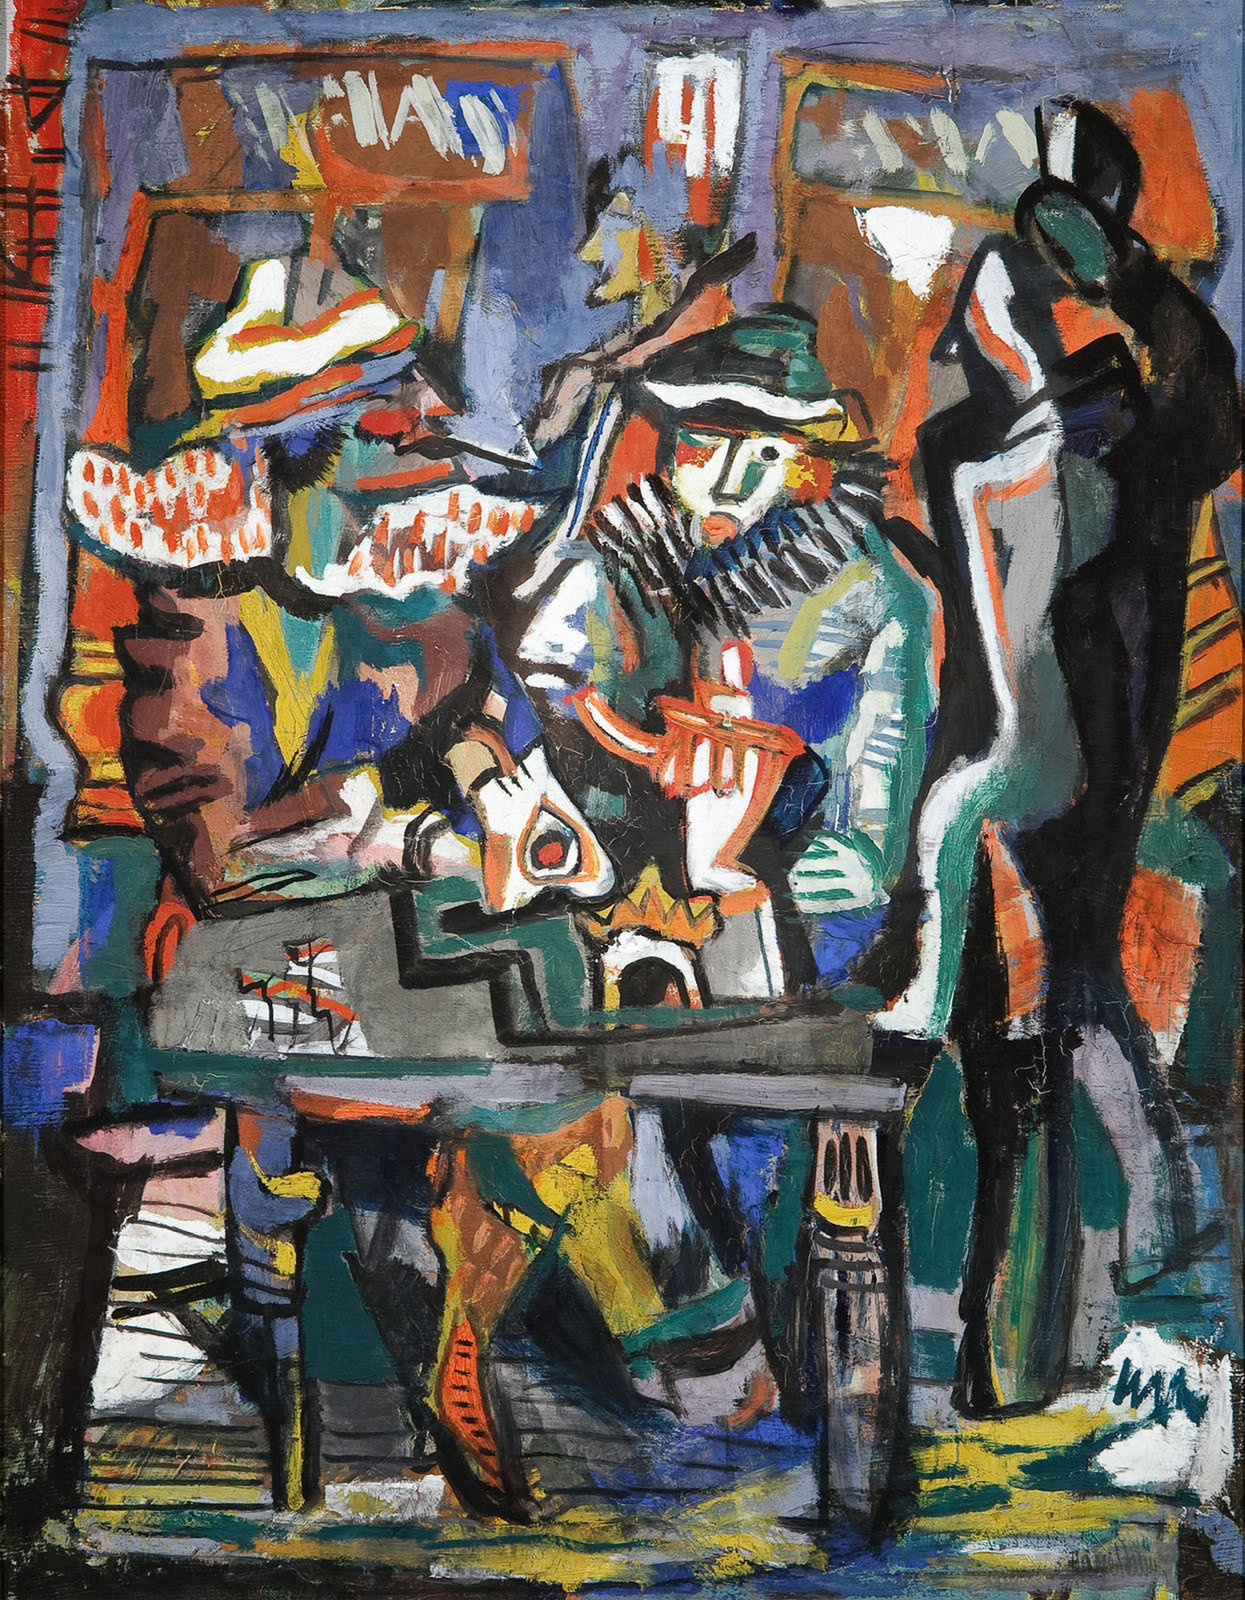 Café Concert, 1925-1927, Marcel Janco, National Museum of Art Romania, Romanian Modern Art Gallery, CC0